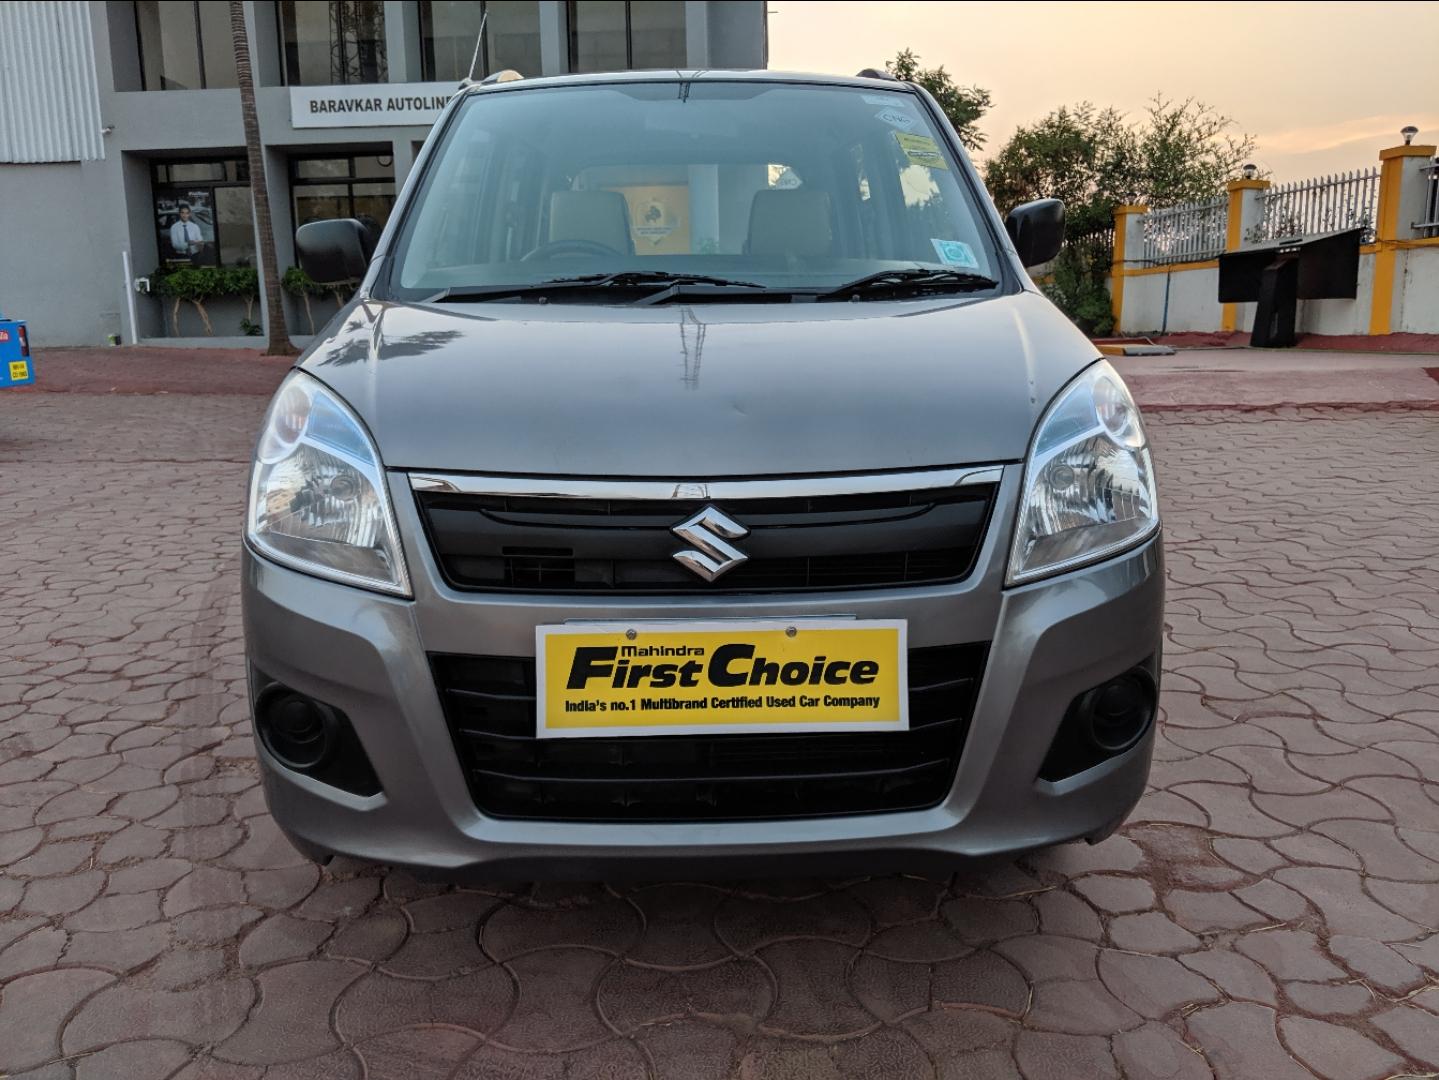 2017 Used Maruti Suzuki Wagon R LXI LPG